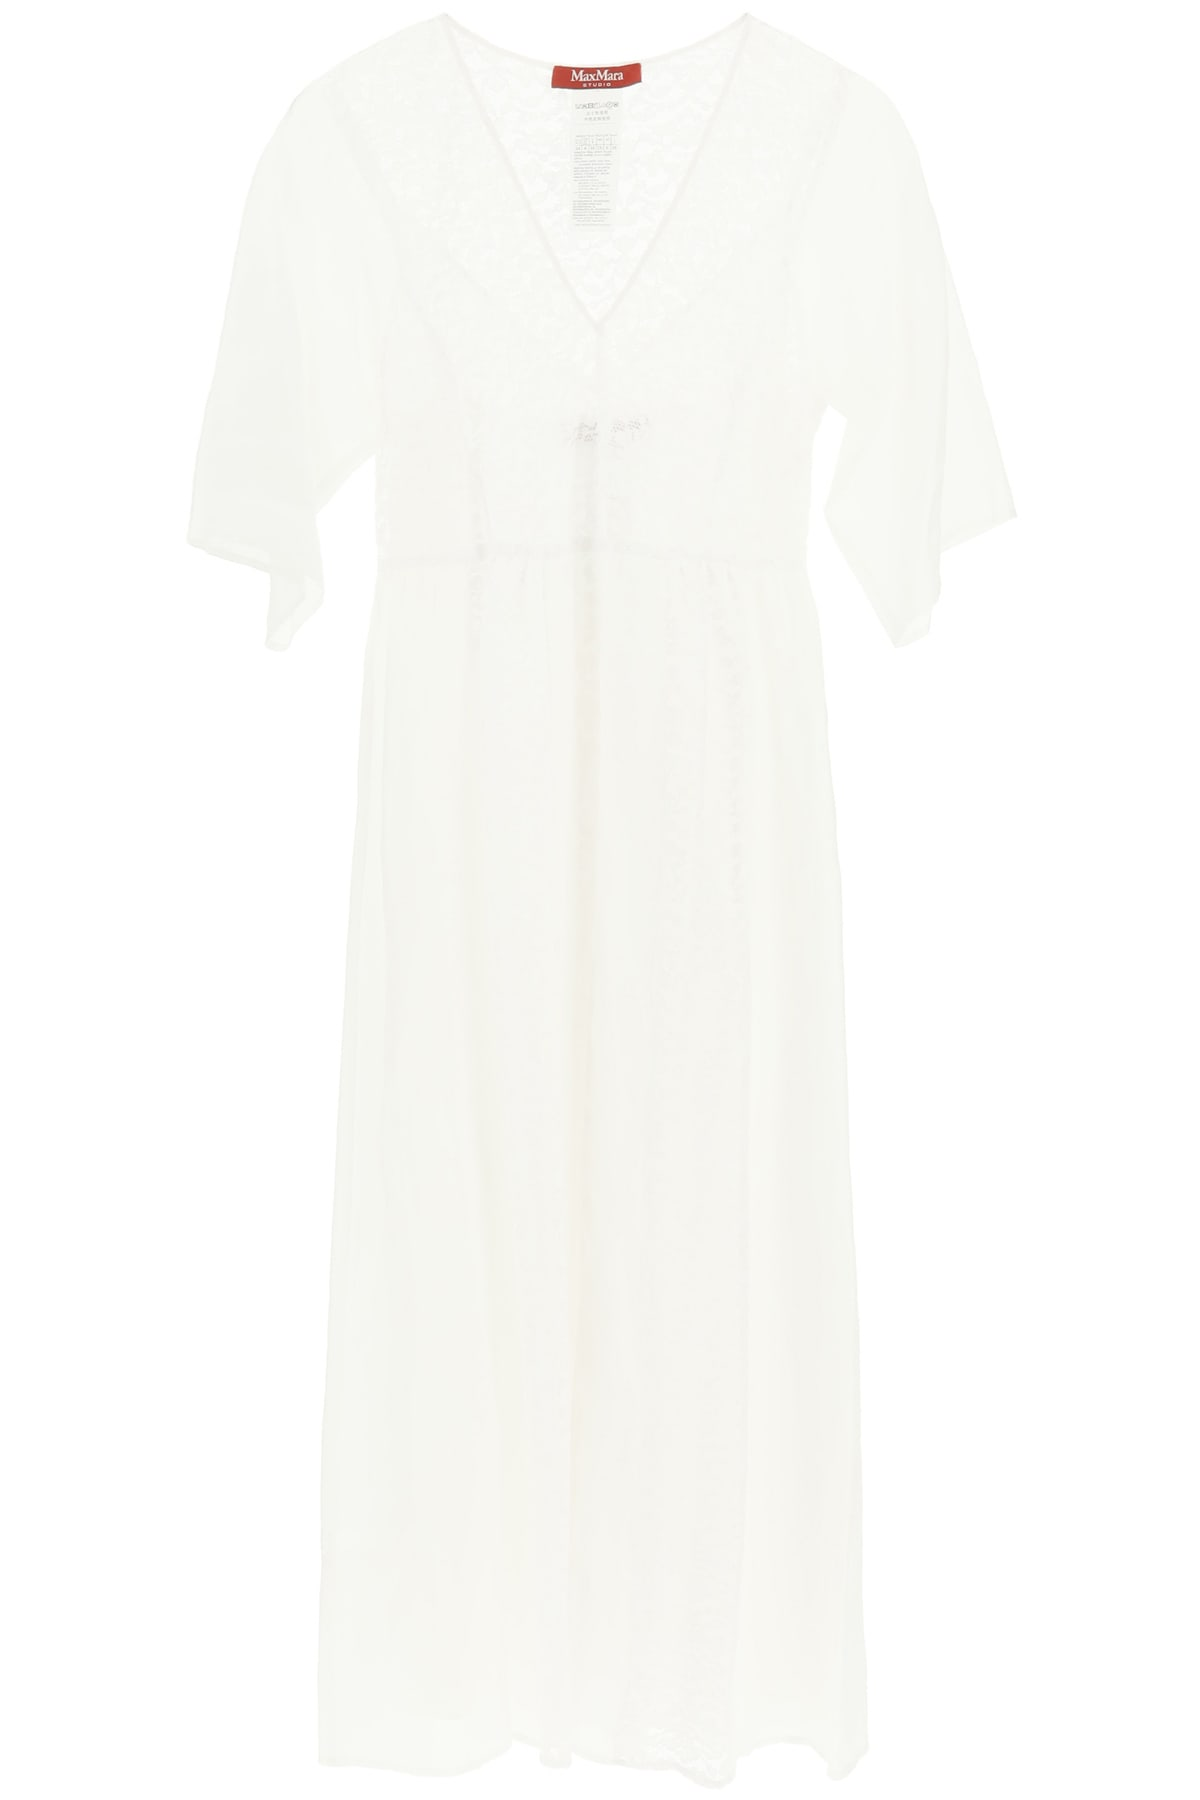 Max Mara Maxi dresses LONG DRESS WITH LACE INSERTS